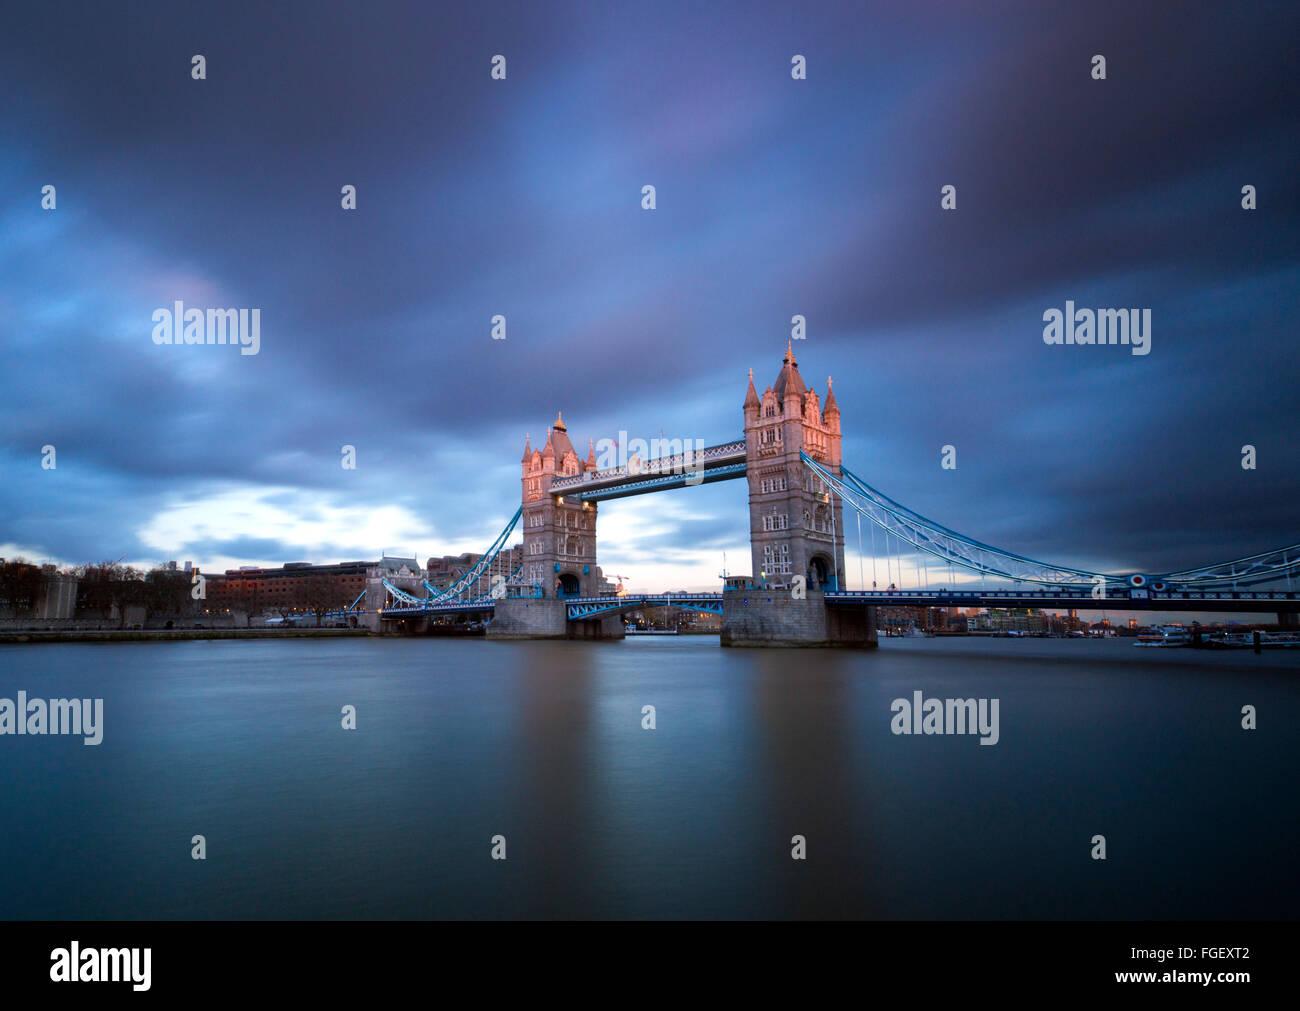 Sonnenuntergang Langzeitbelichtung auf Tower Bridge, London England UK Stockbild